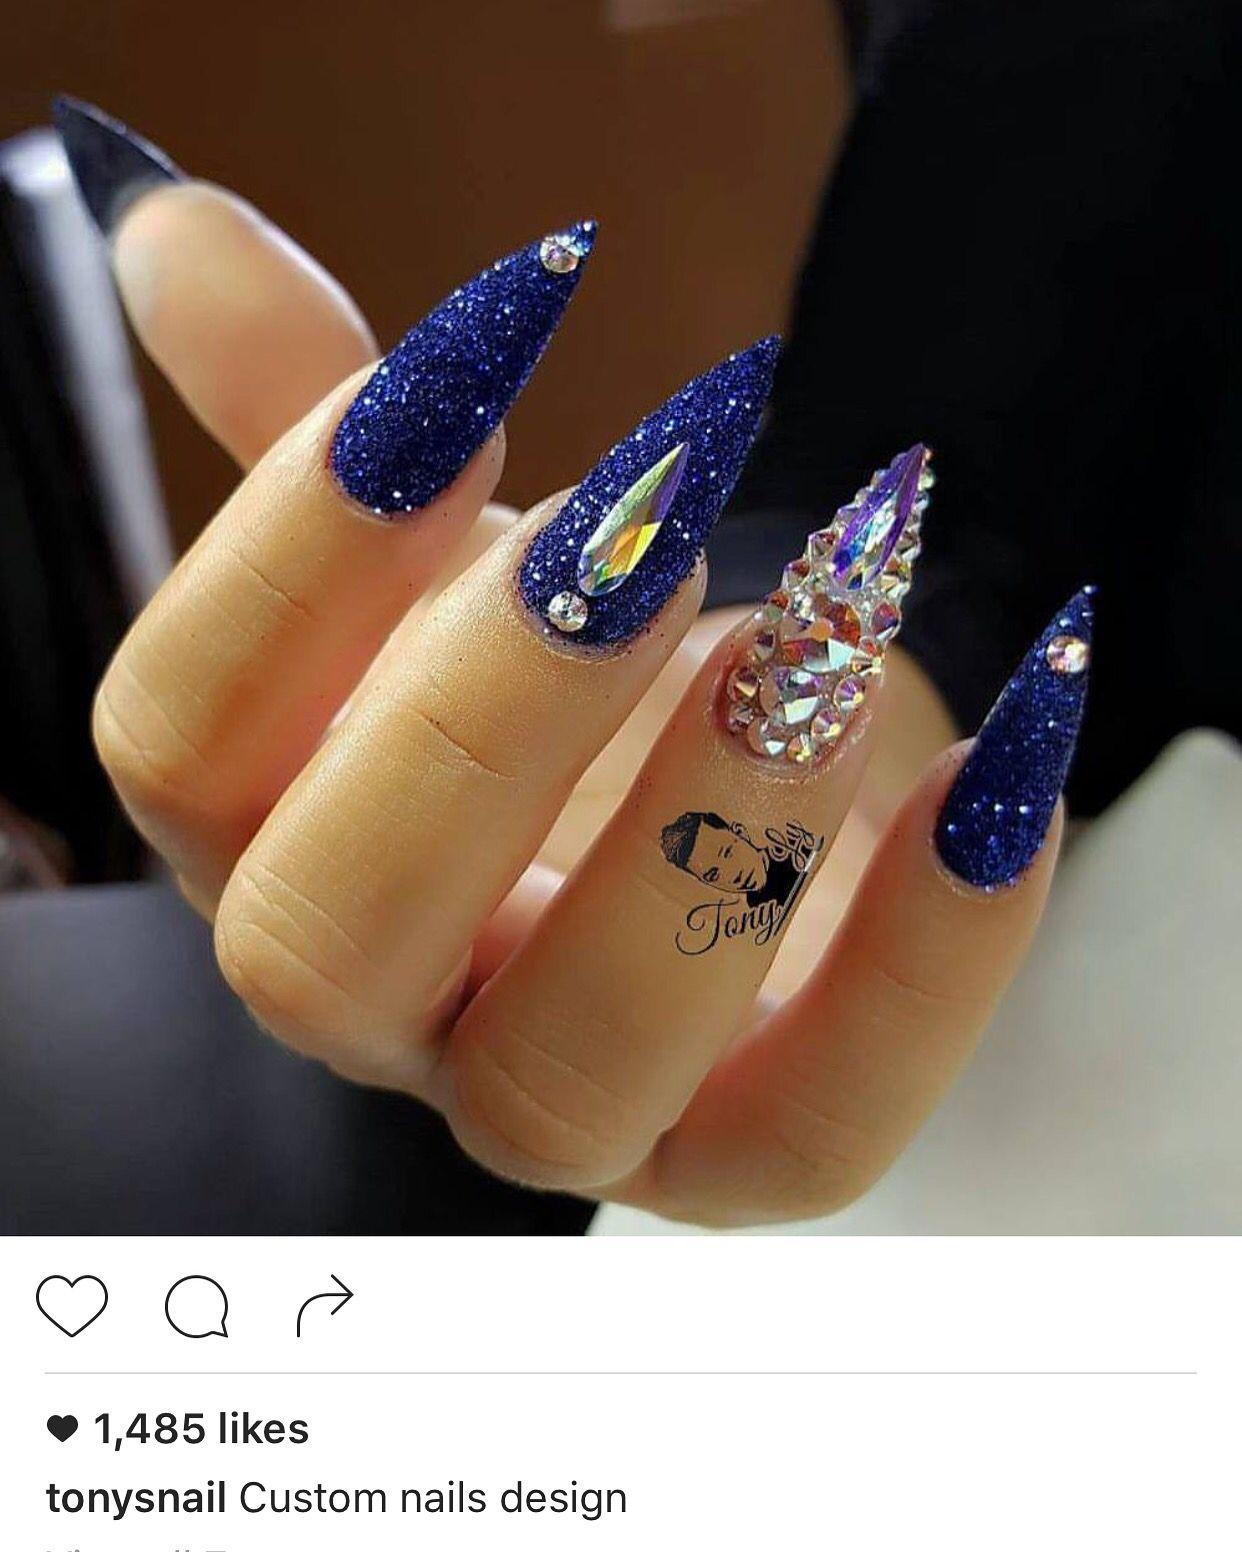 Blue glitter ombr 233 stiletto nails - My Amazing Nail Done By Tonysnail On Instagram